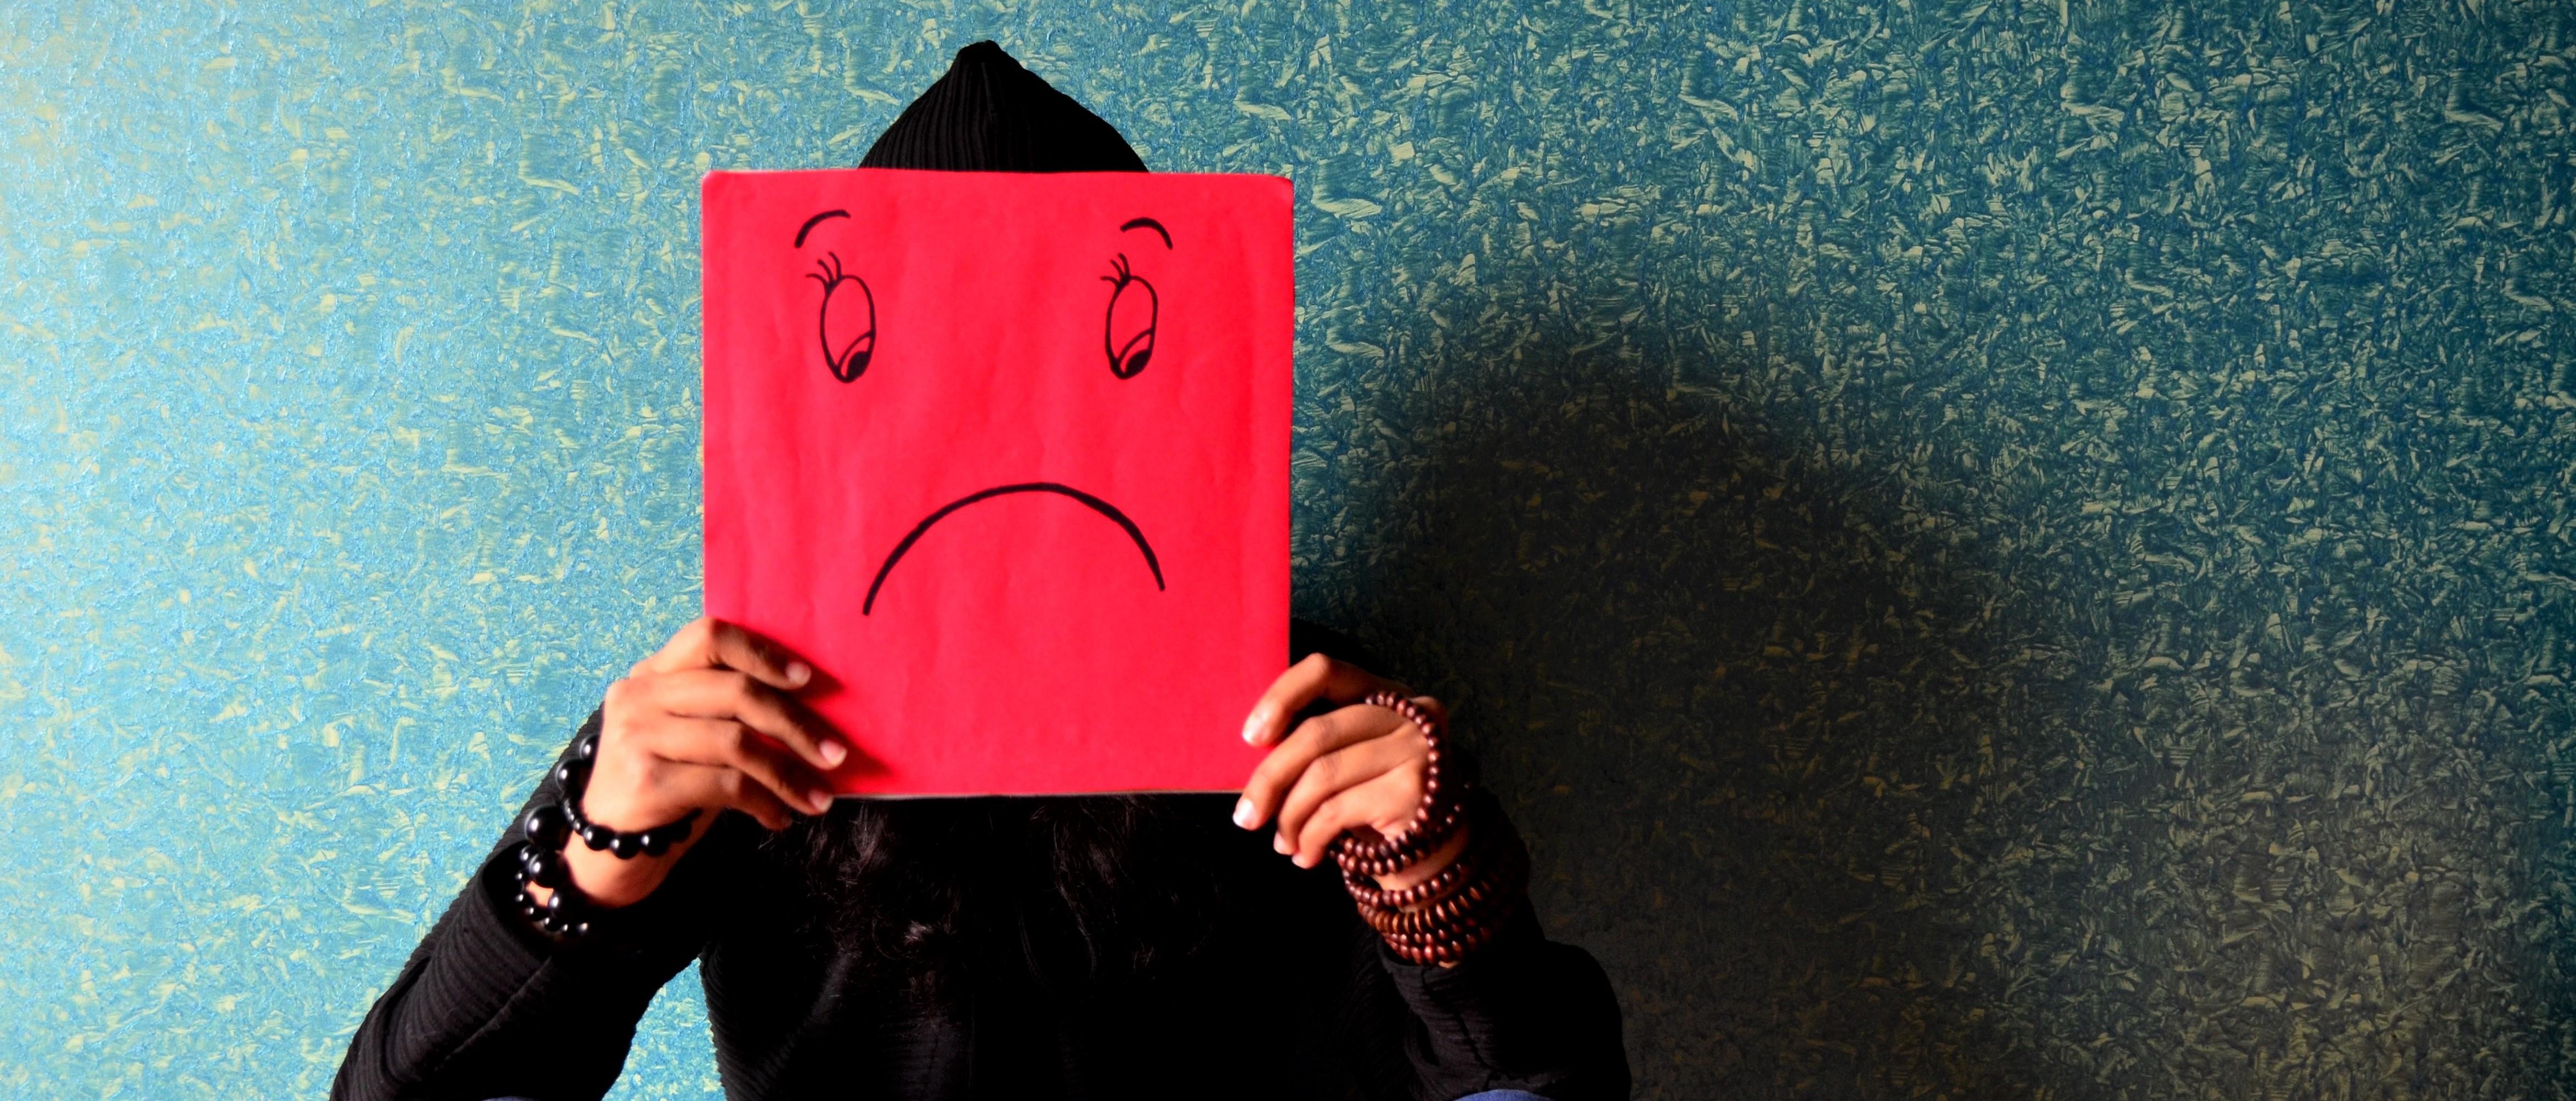 Adolescent expressing sadness.